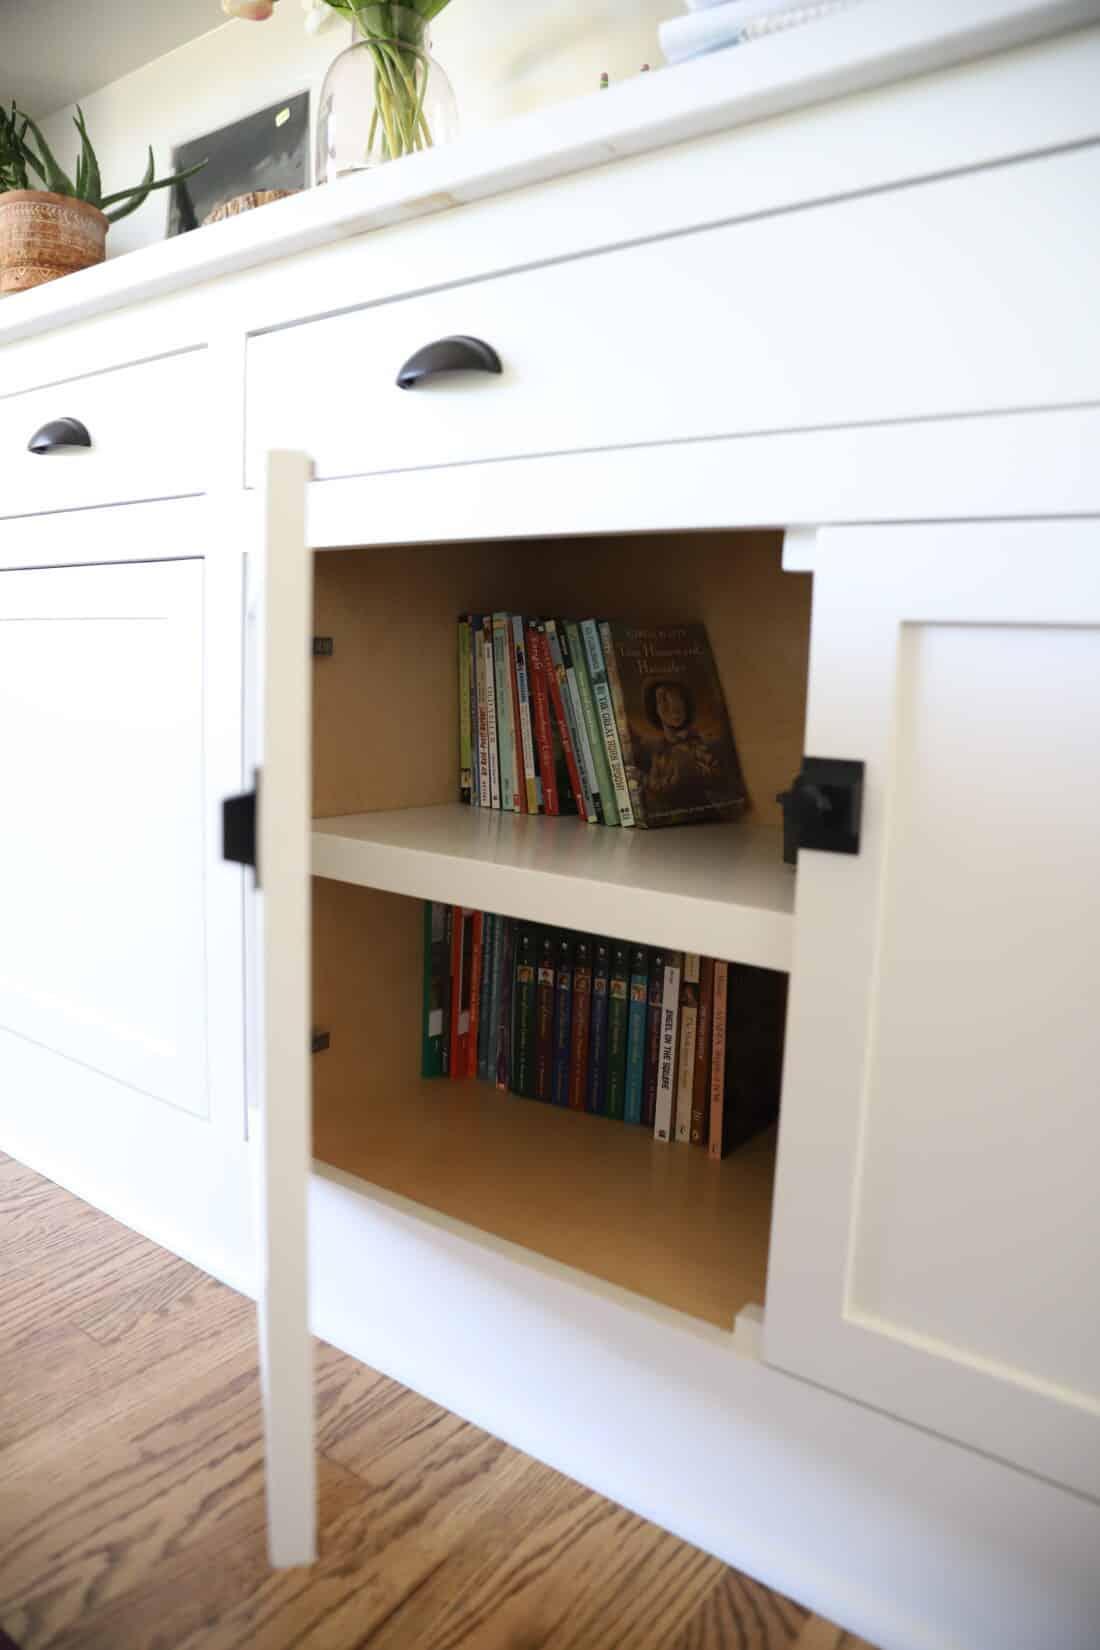 Get Ready for a New Homeschool Year book organization